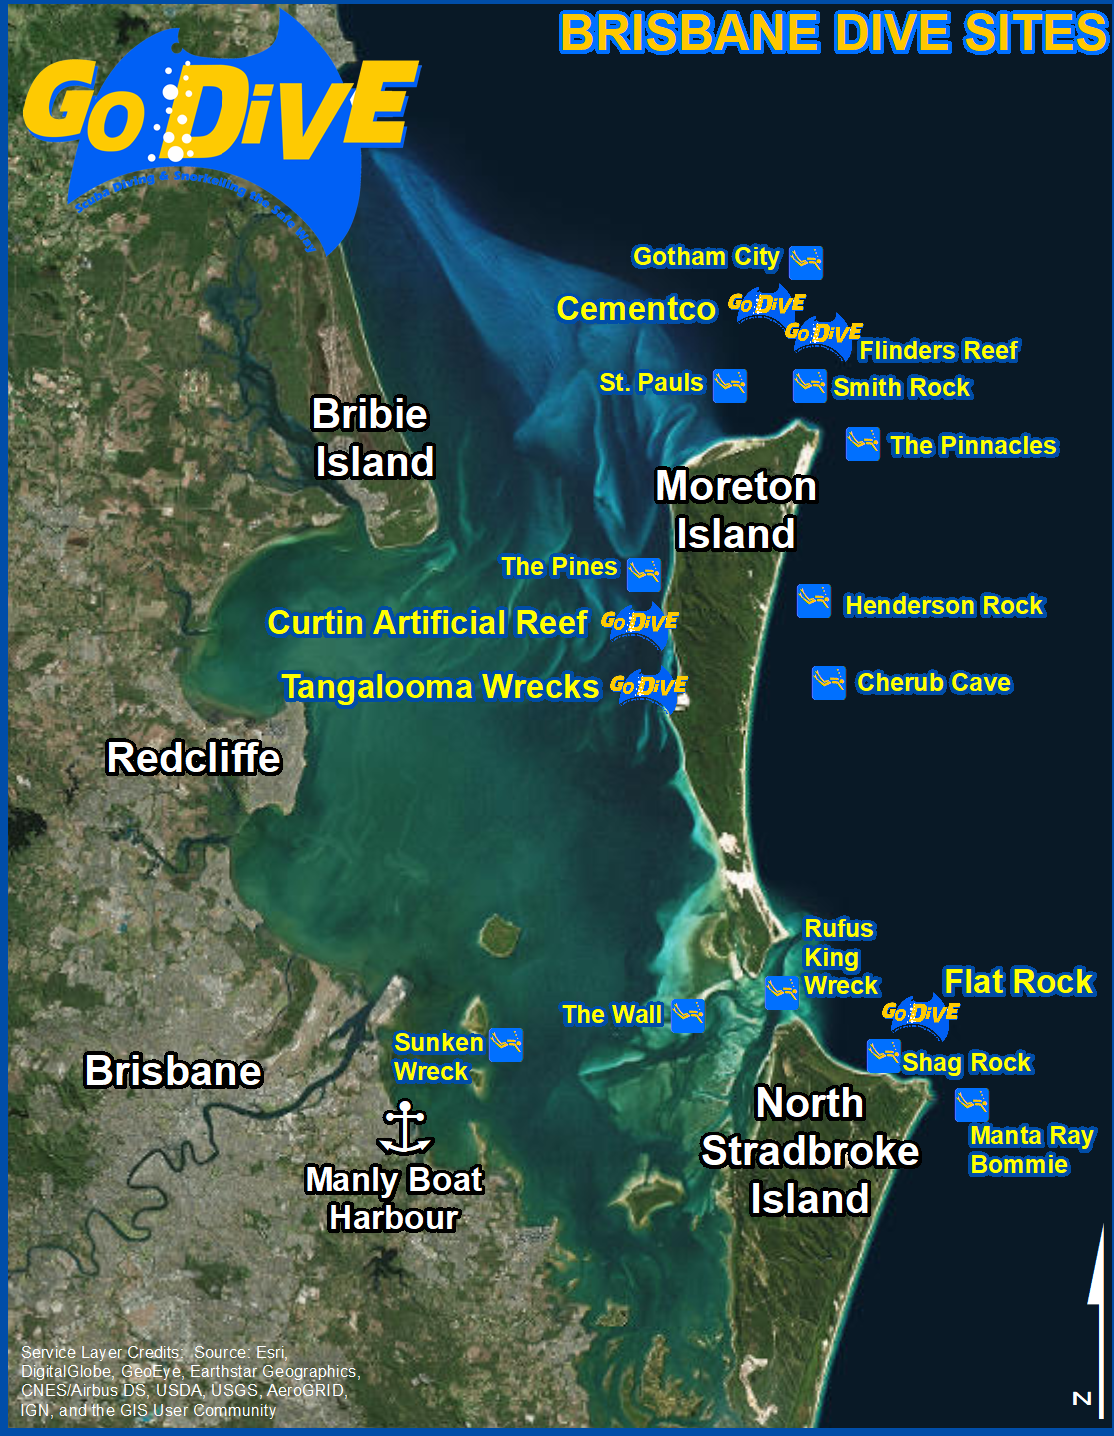 Brisbane Dive Locations